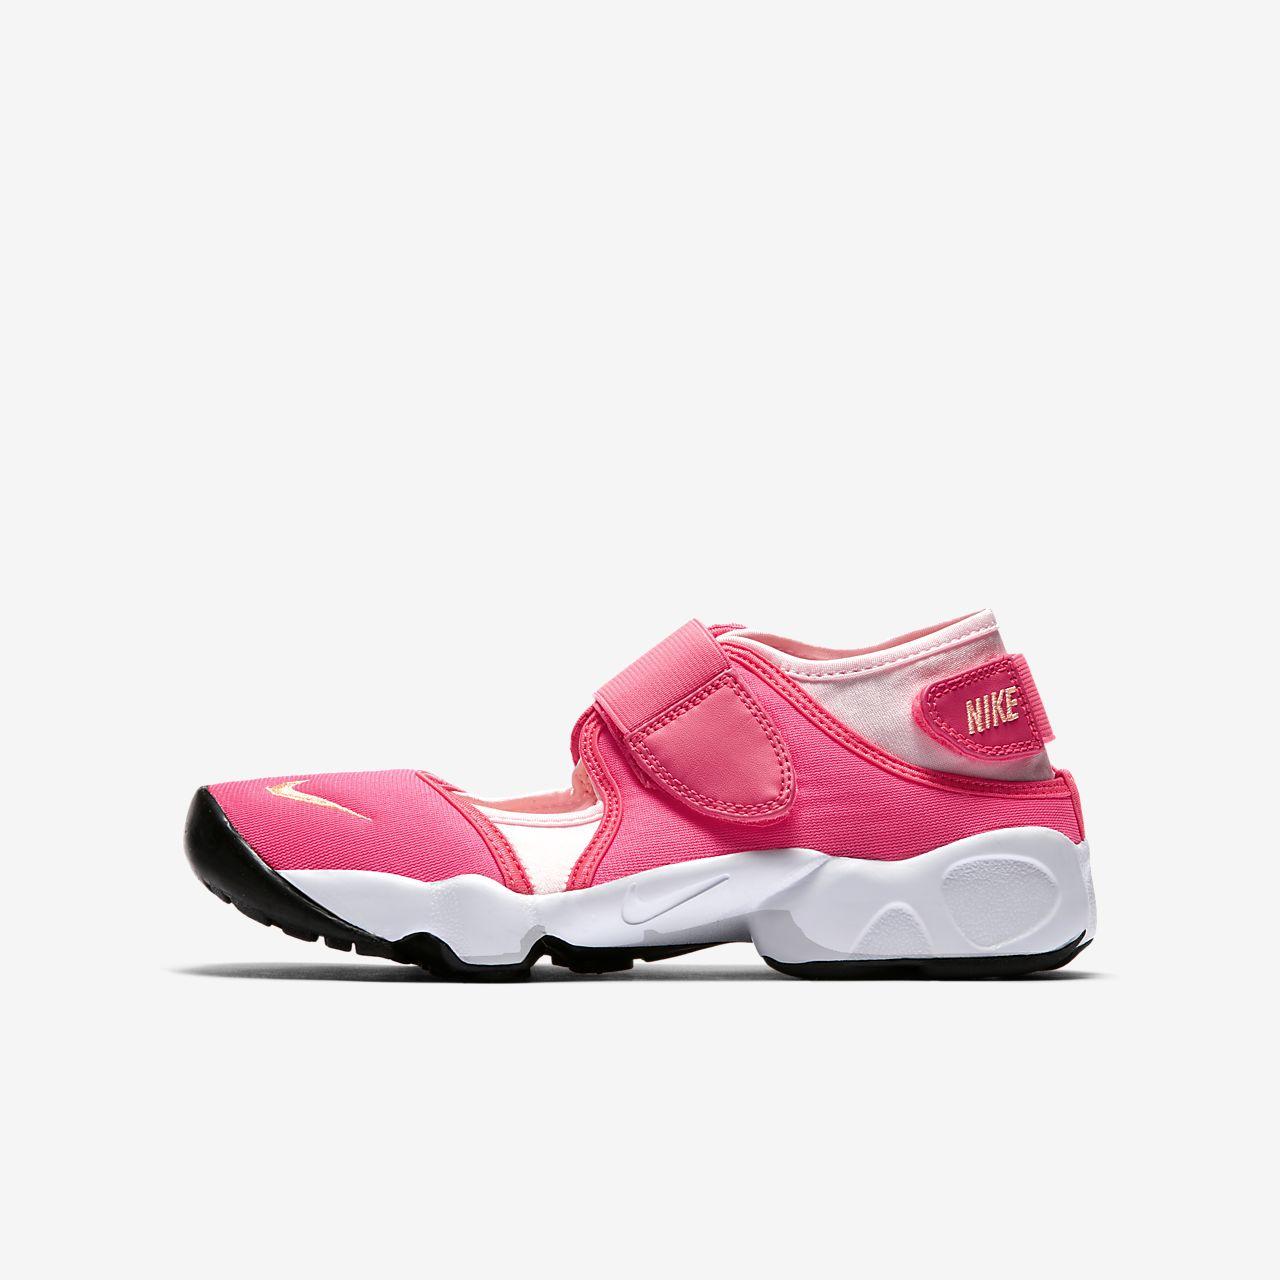 7b29a9bede90e0 Nike Rift Zapatillas - Niño a y niño a pequeño a . Nike.com ES